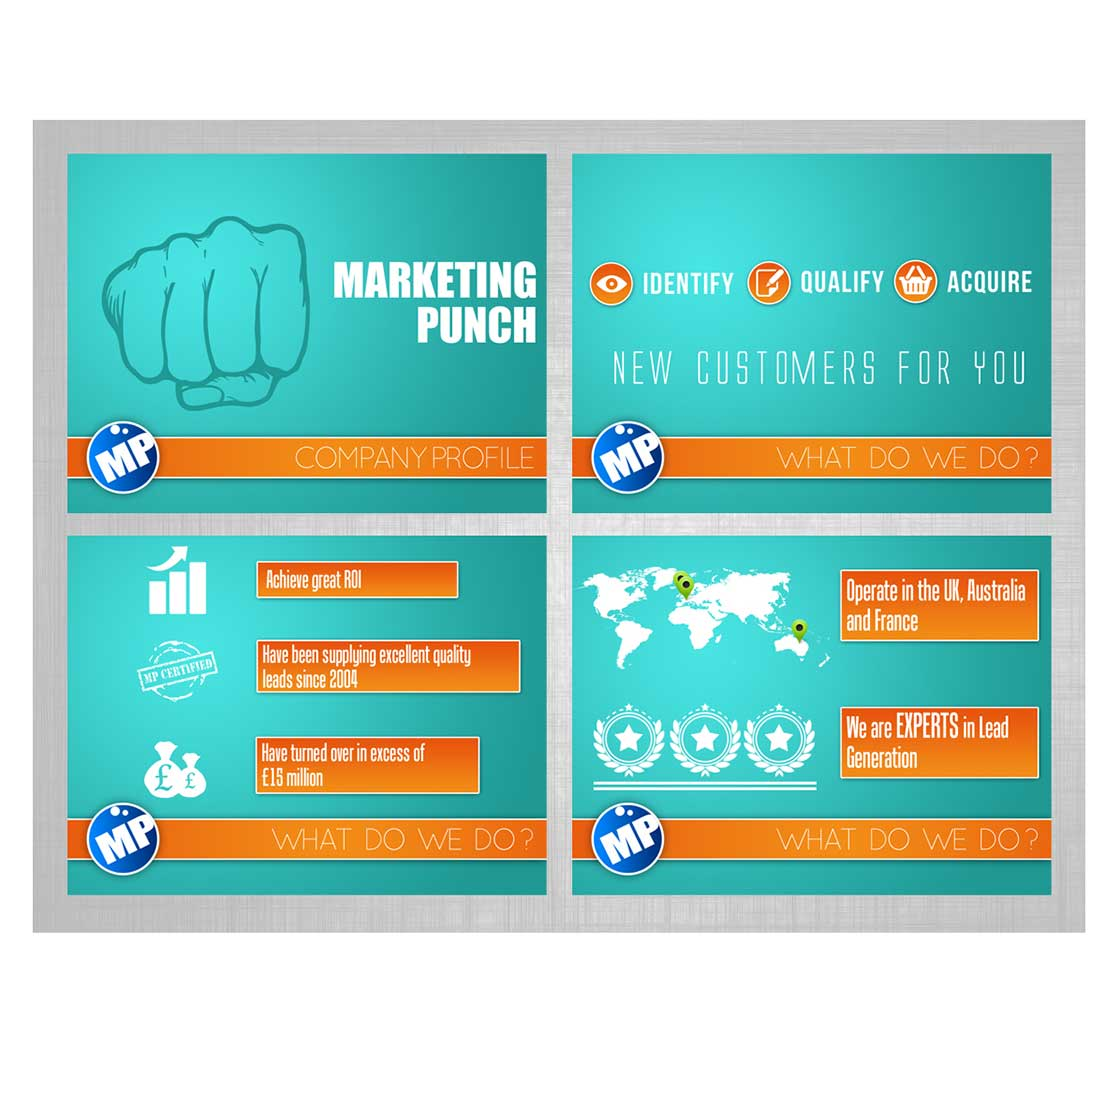 crowdspring presentation design by Purpletouch